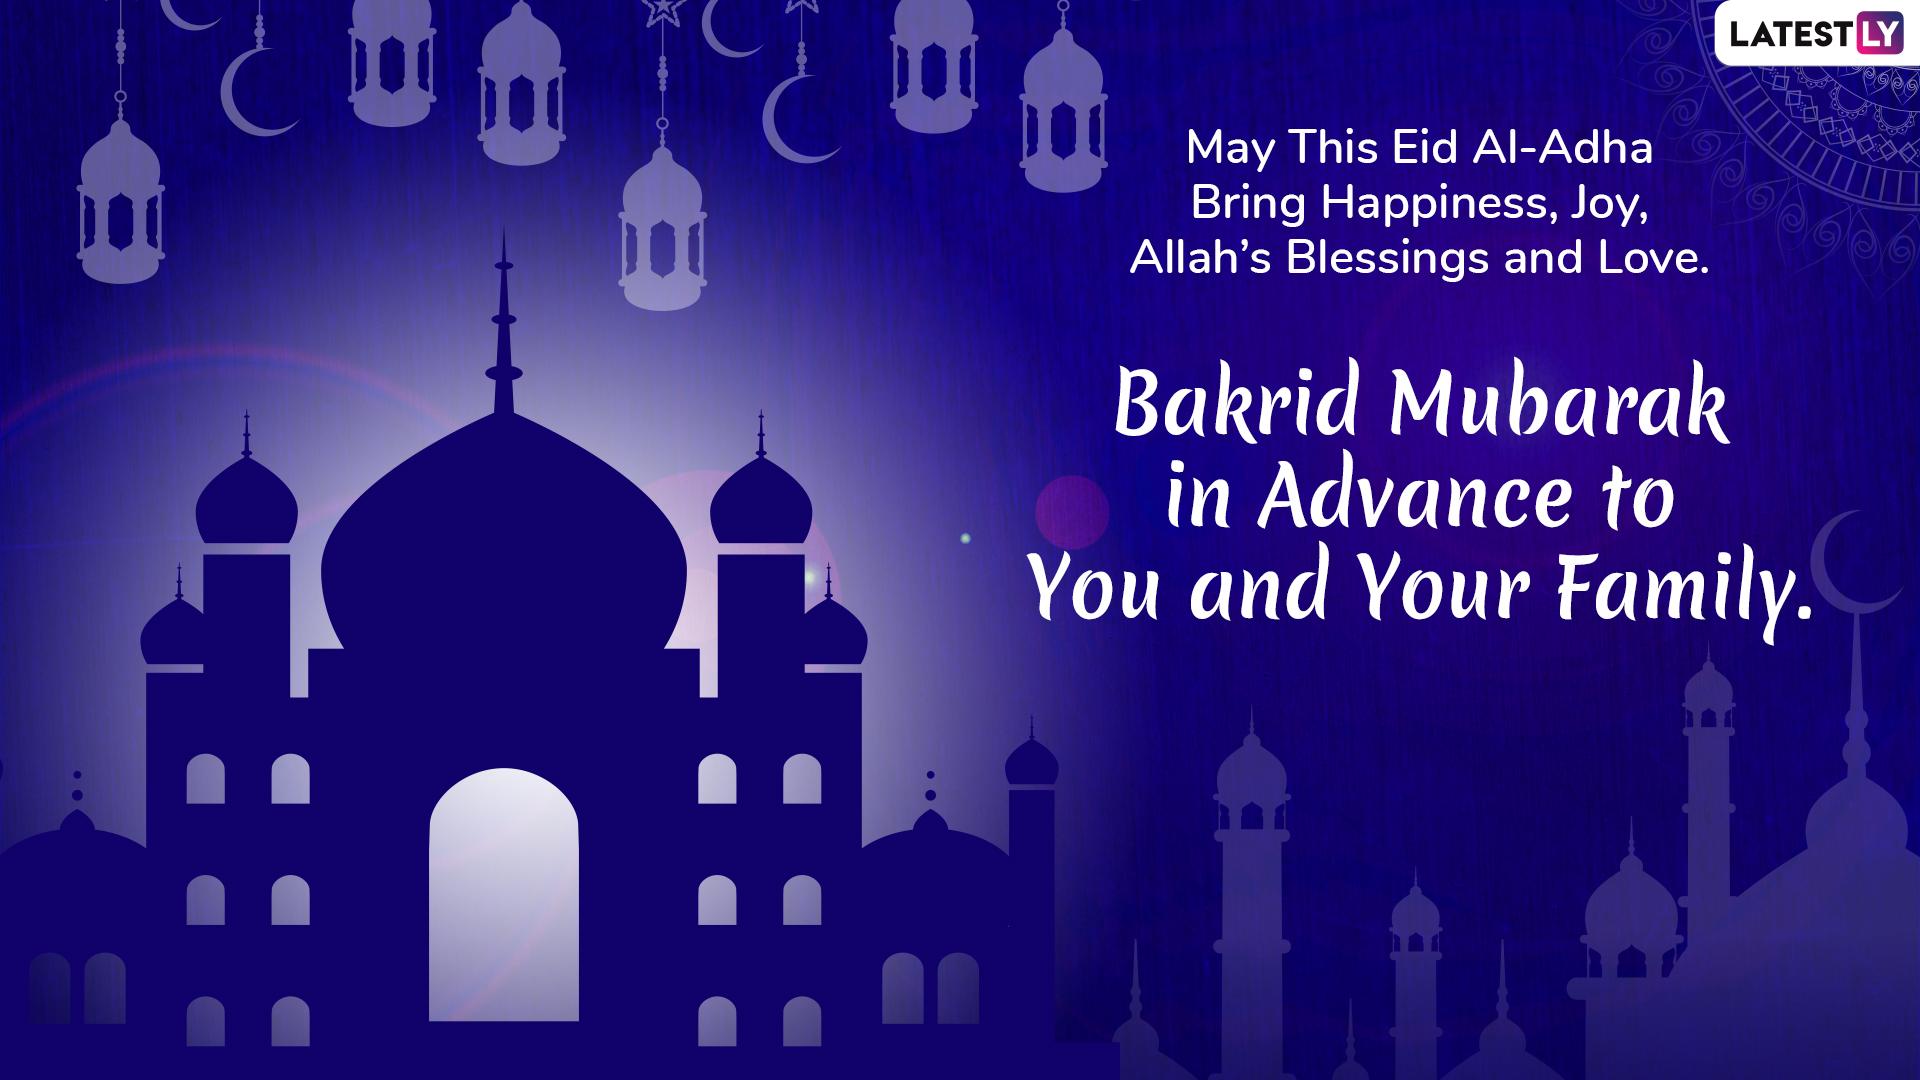 Bakrid 2019 Wishes in Advance: Eid Al-Adha Mubarak WhatsApp Sticker